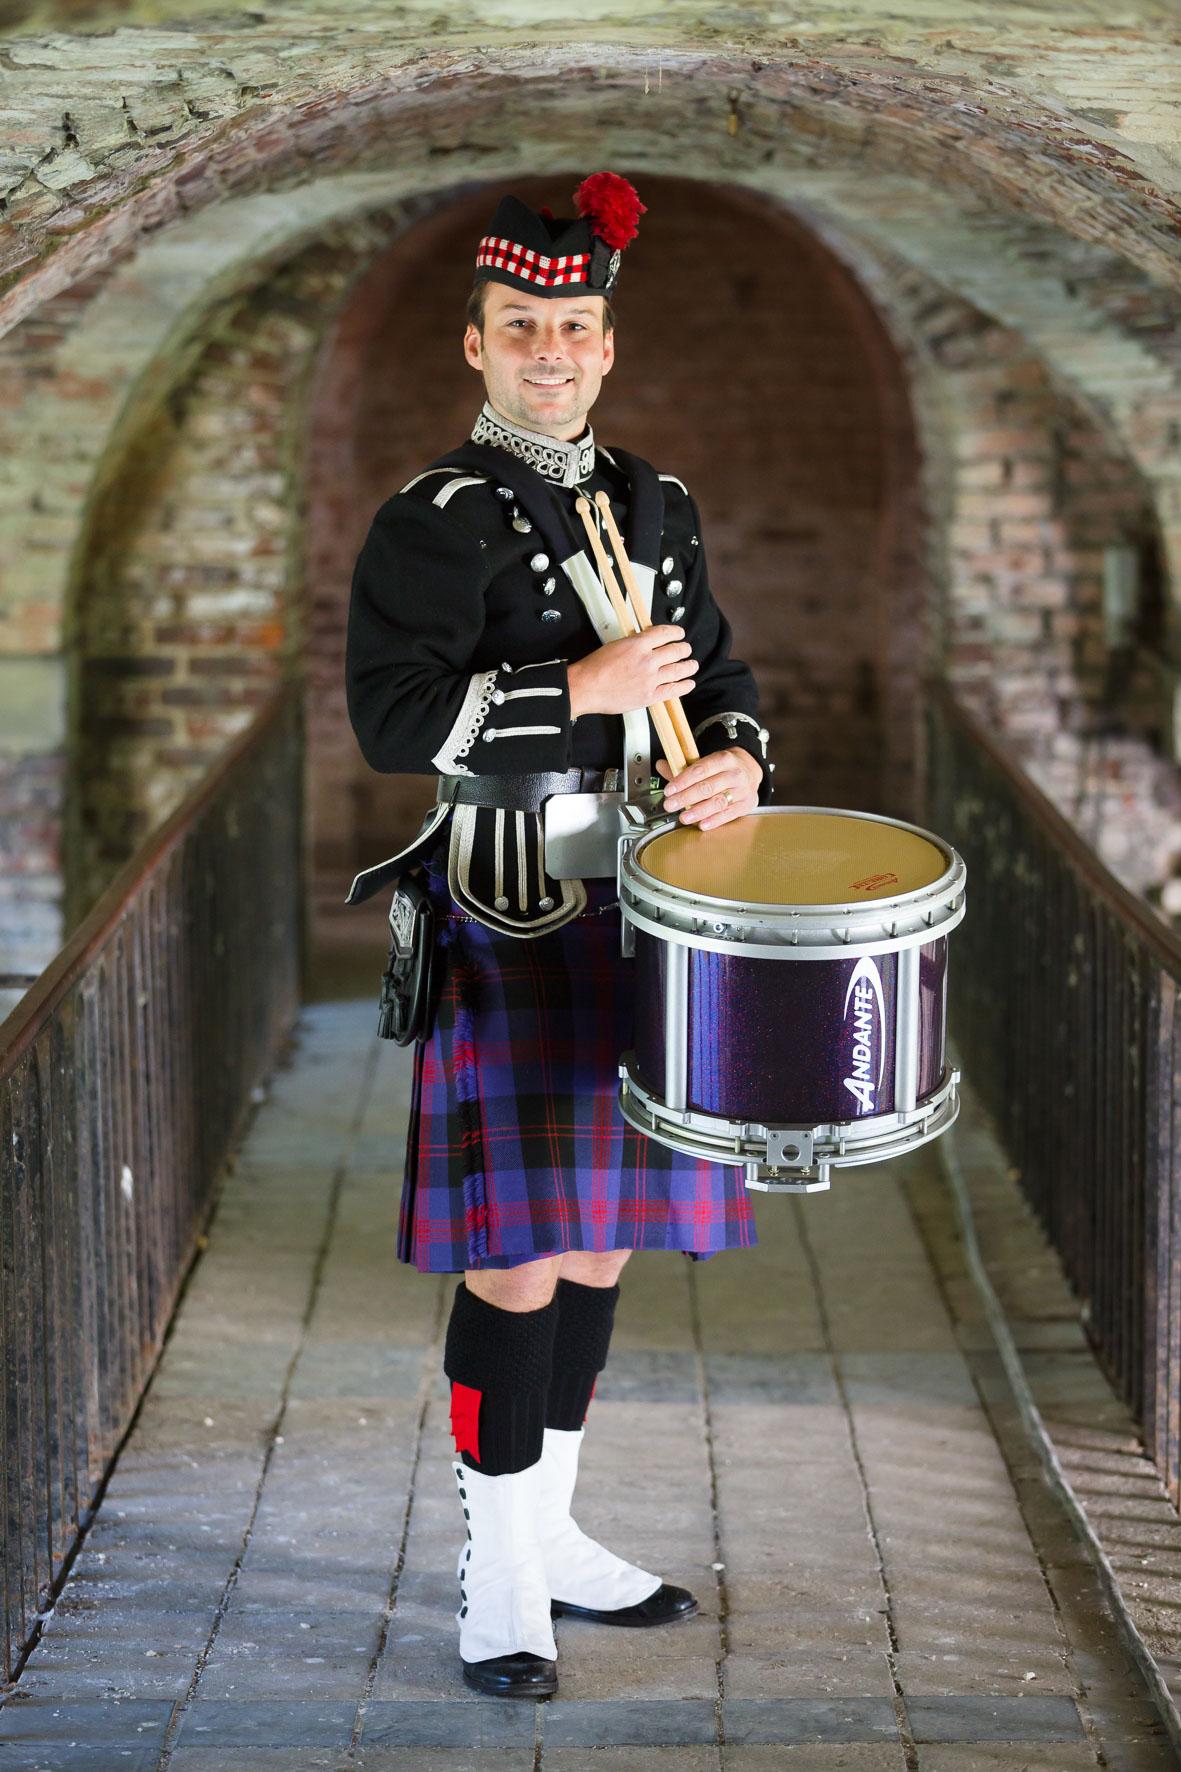 Richard the scottish drummer